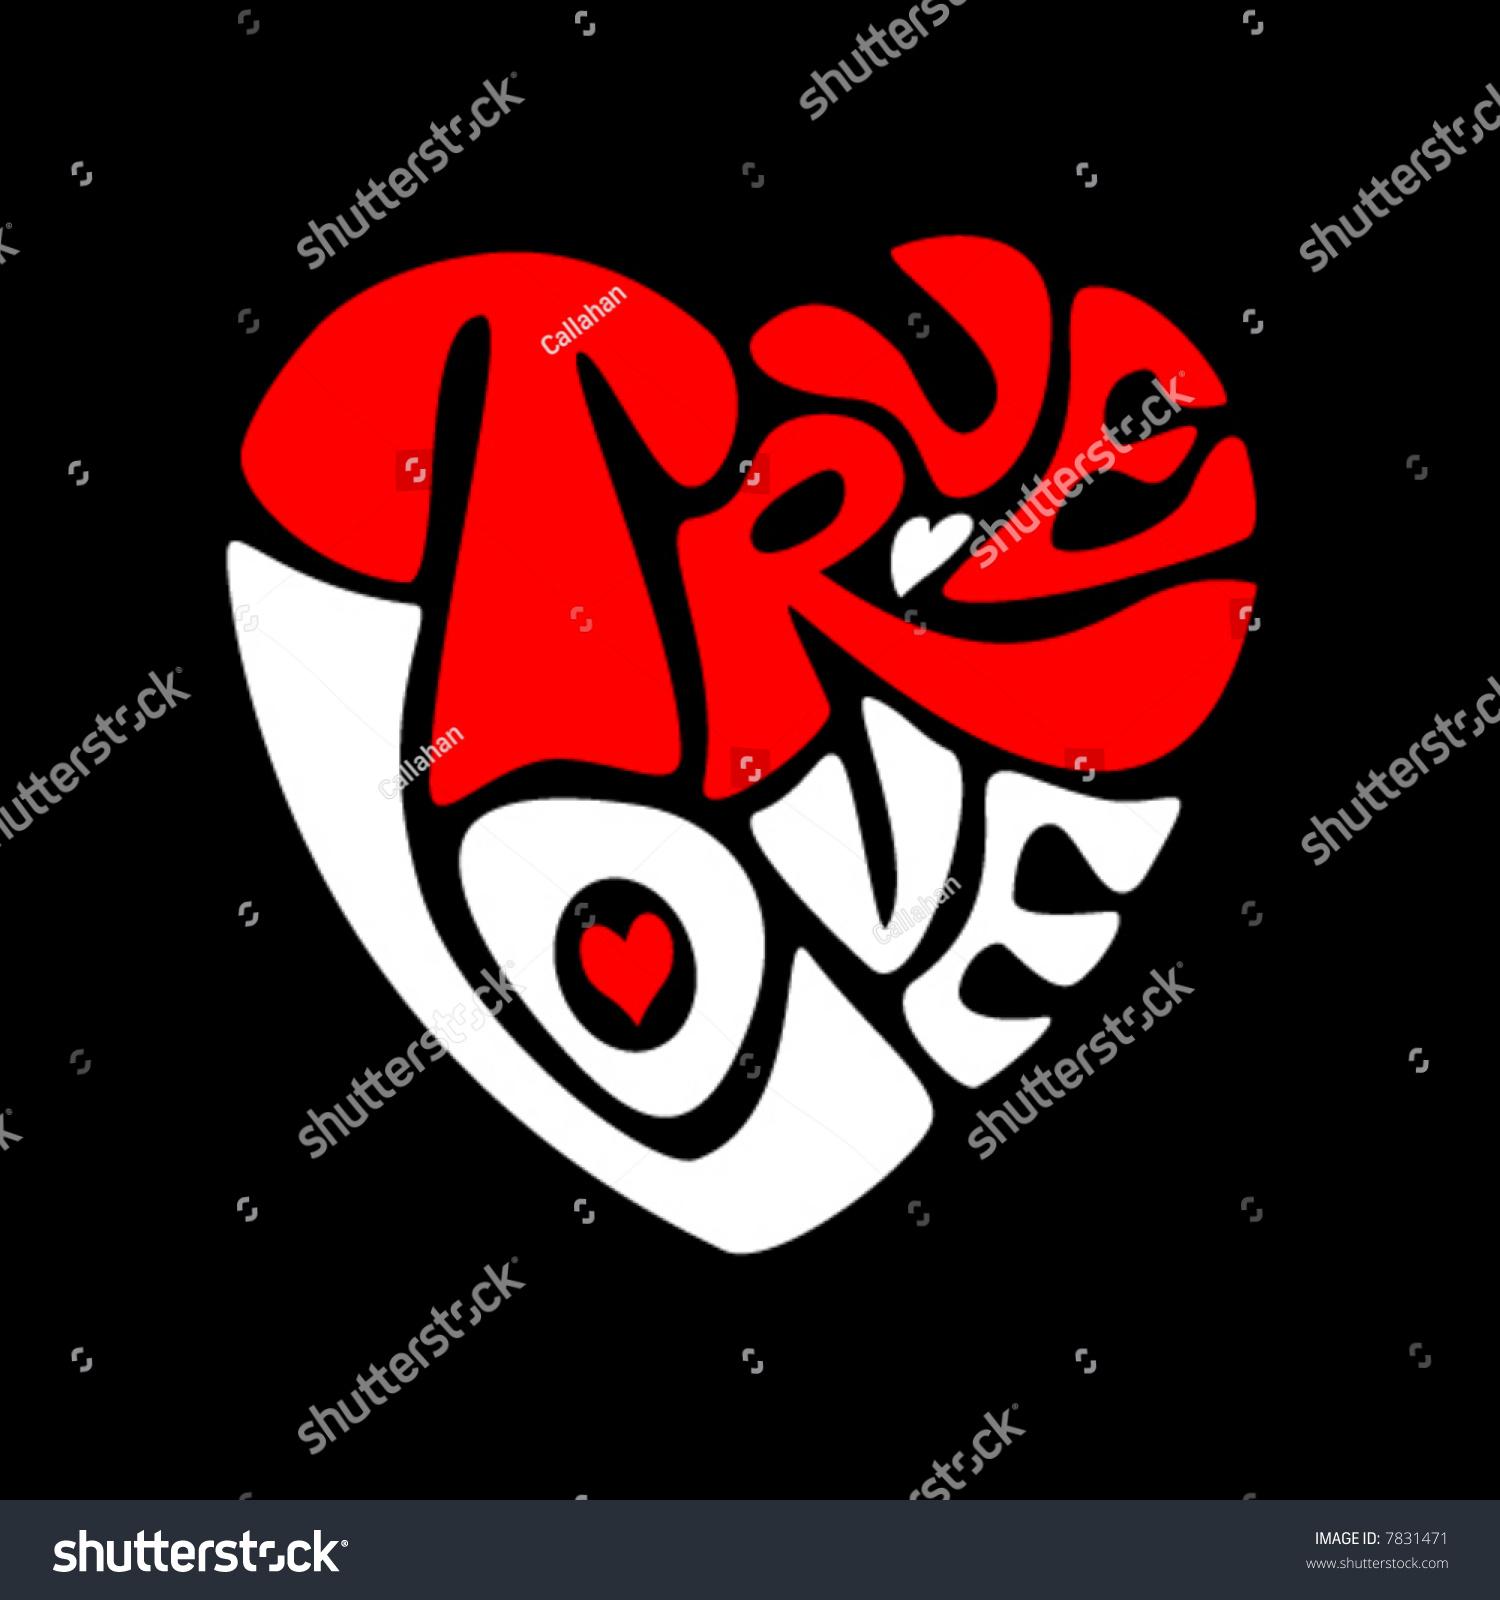 how to create a love heart symbol mac